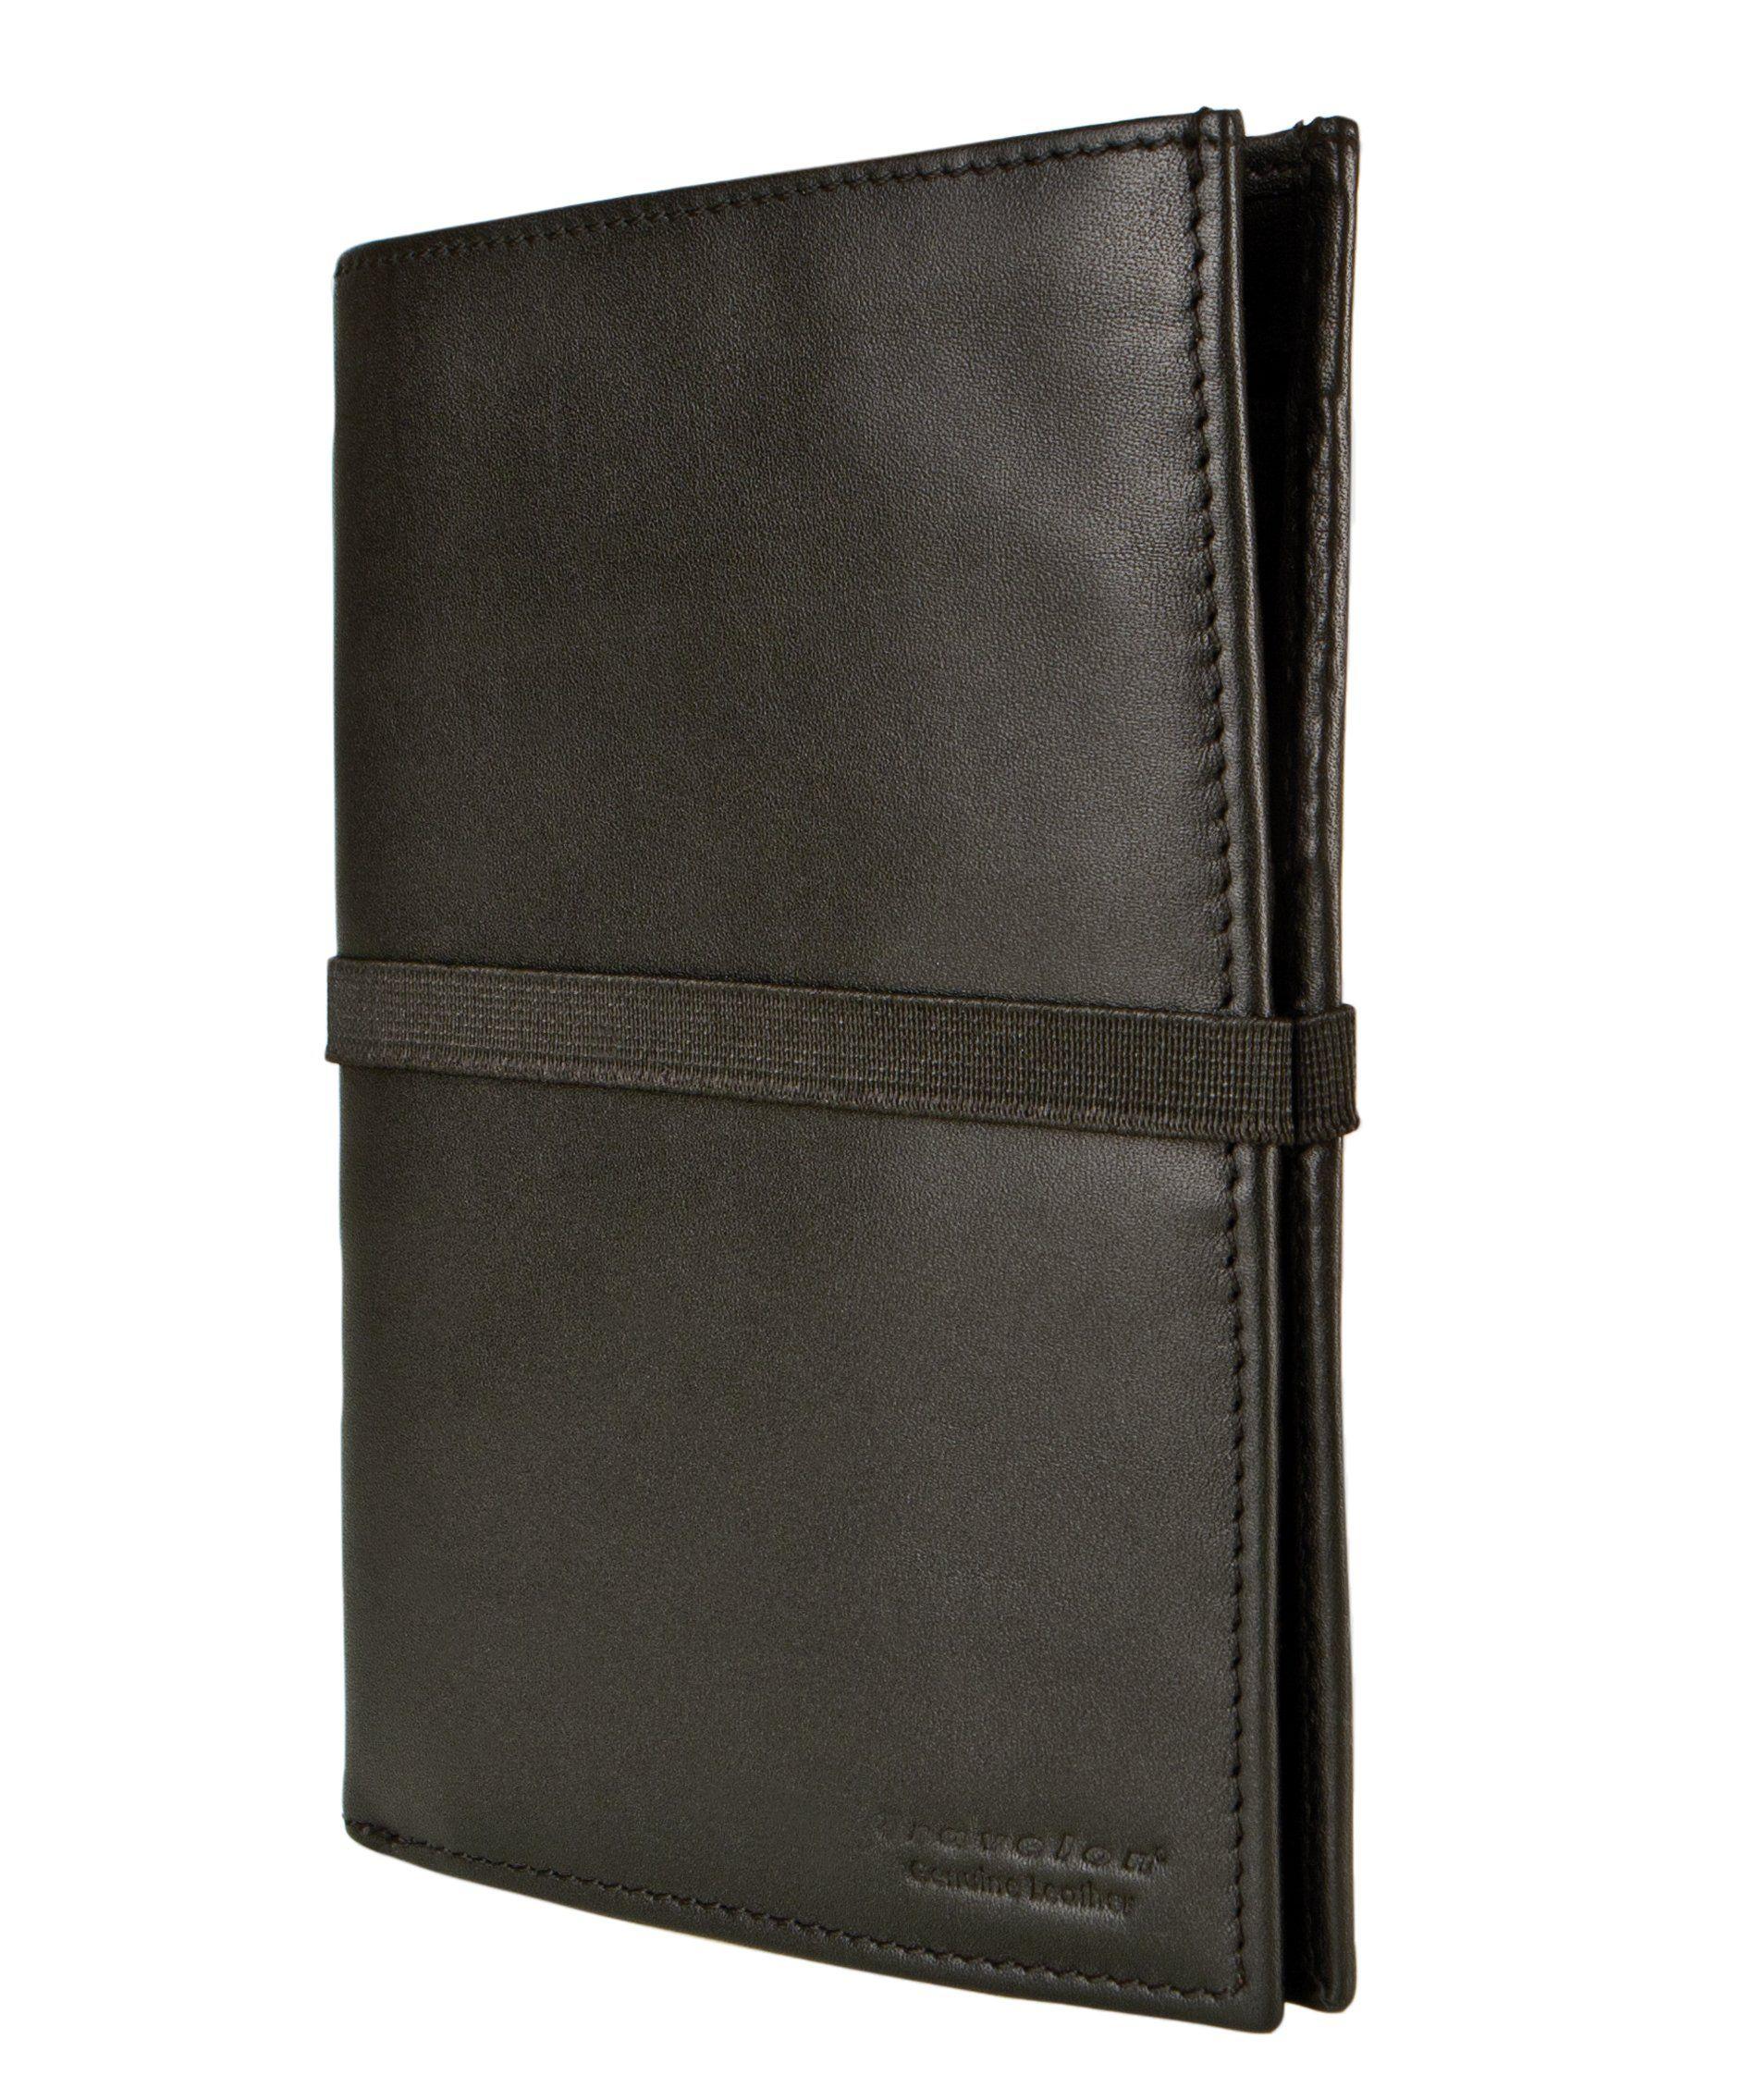 beb4bbce7cef Travelon Luggage Rfid Blocking Leather Wallet Organizer Black One ...